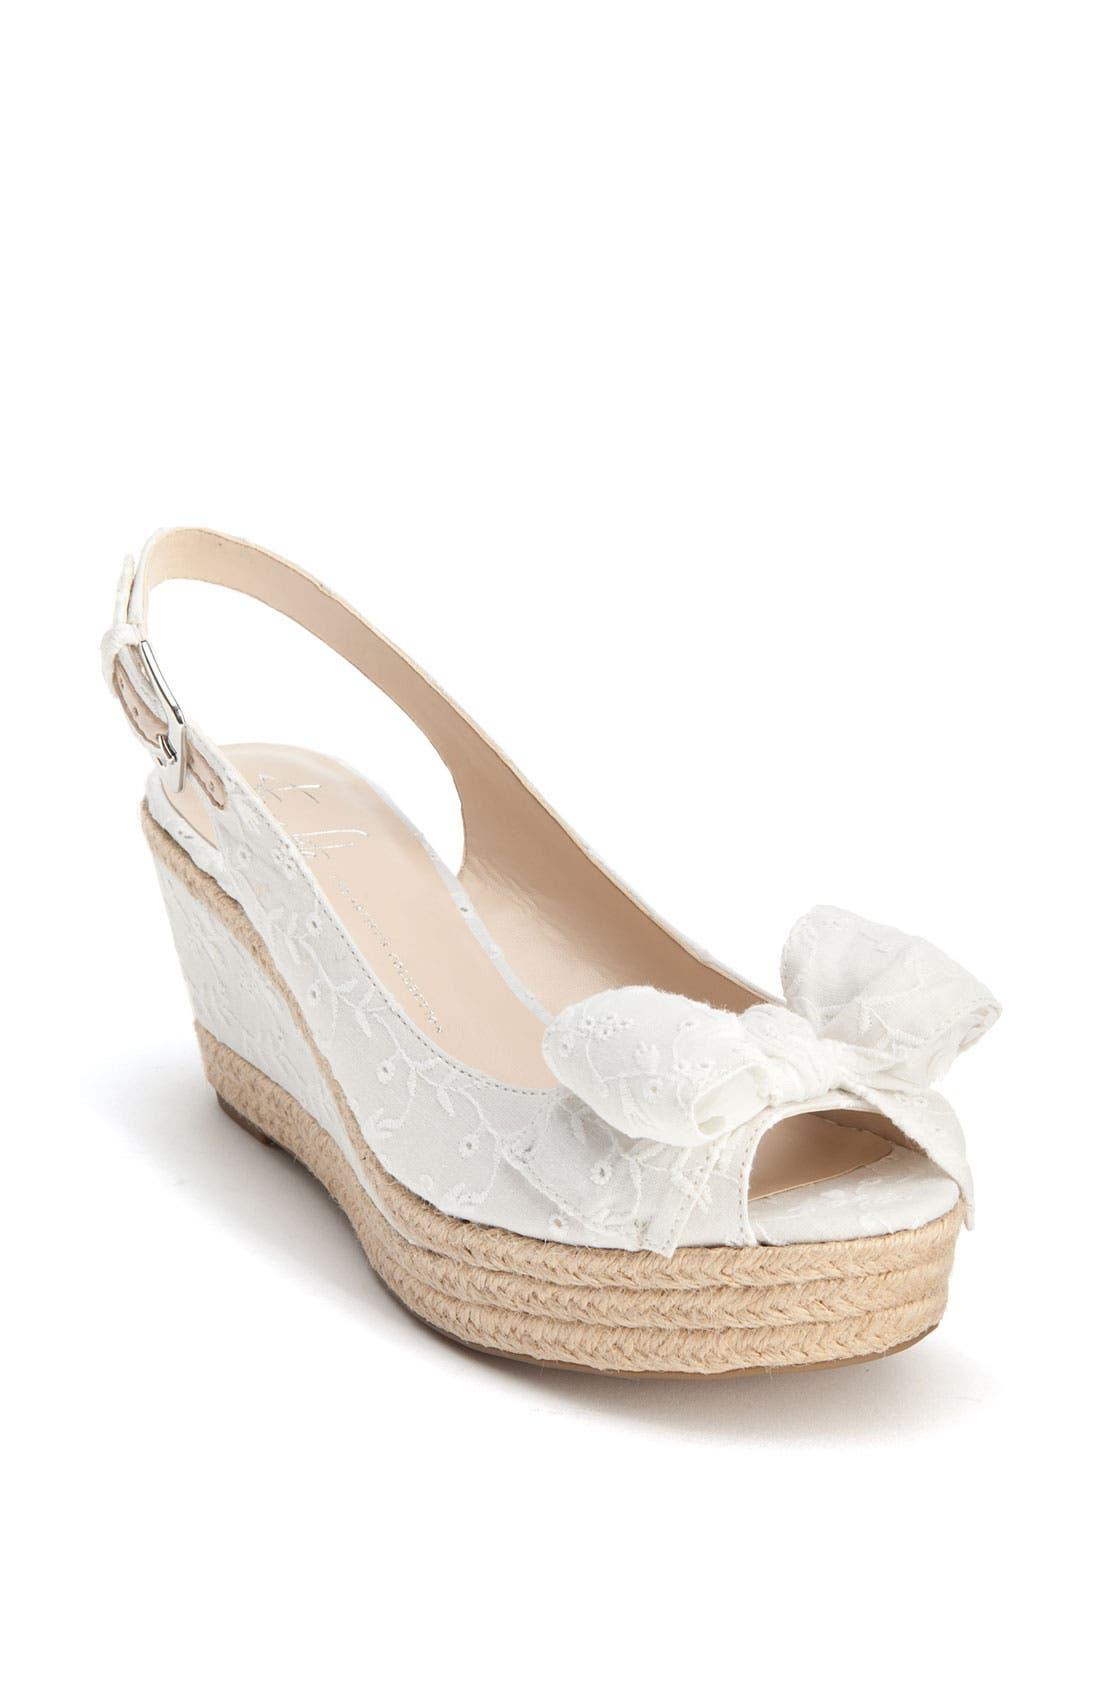 Alternate Image 1 Selected - Franco Sarto 'Olympia' Espadrille Sandal